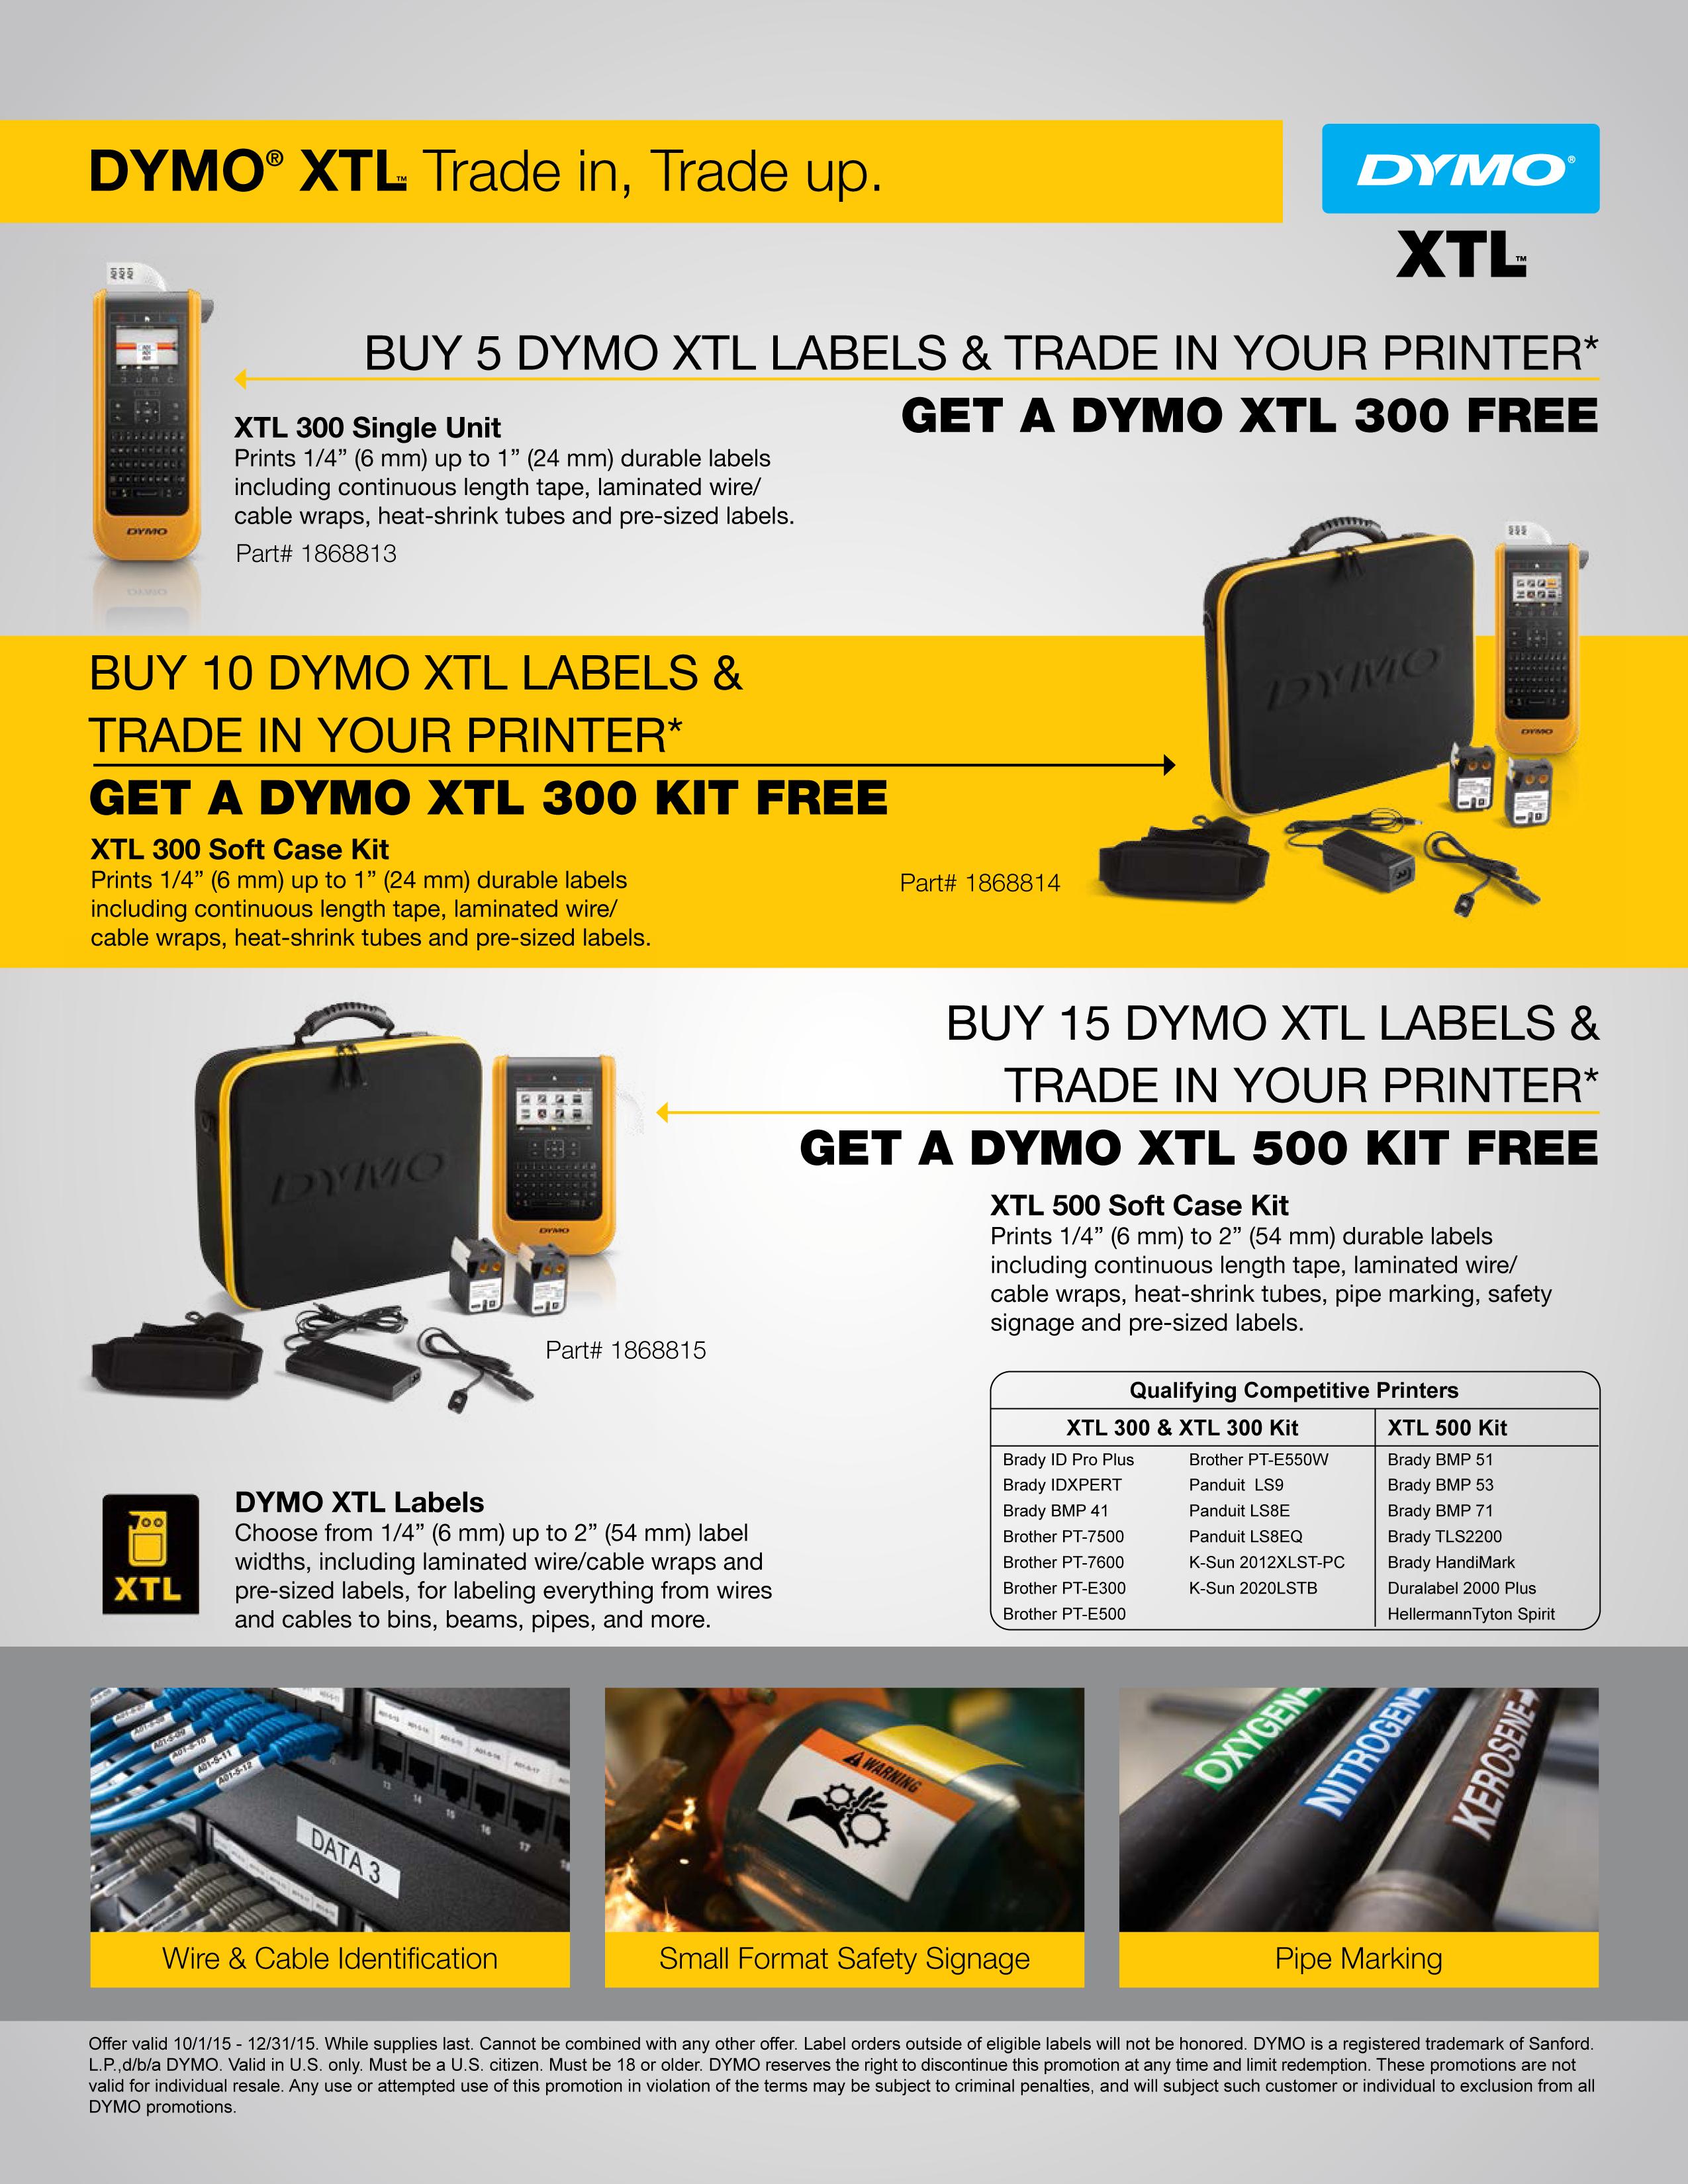 XTL_Trade_In_Promo_Flyer_-_2015